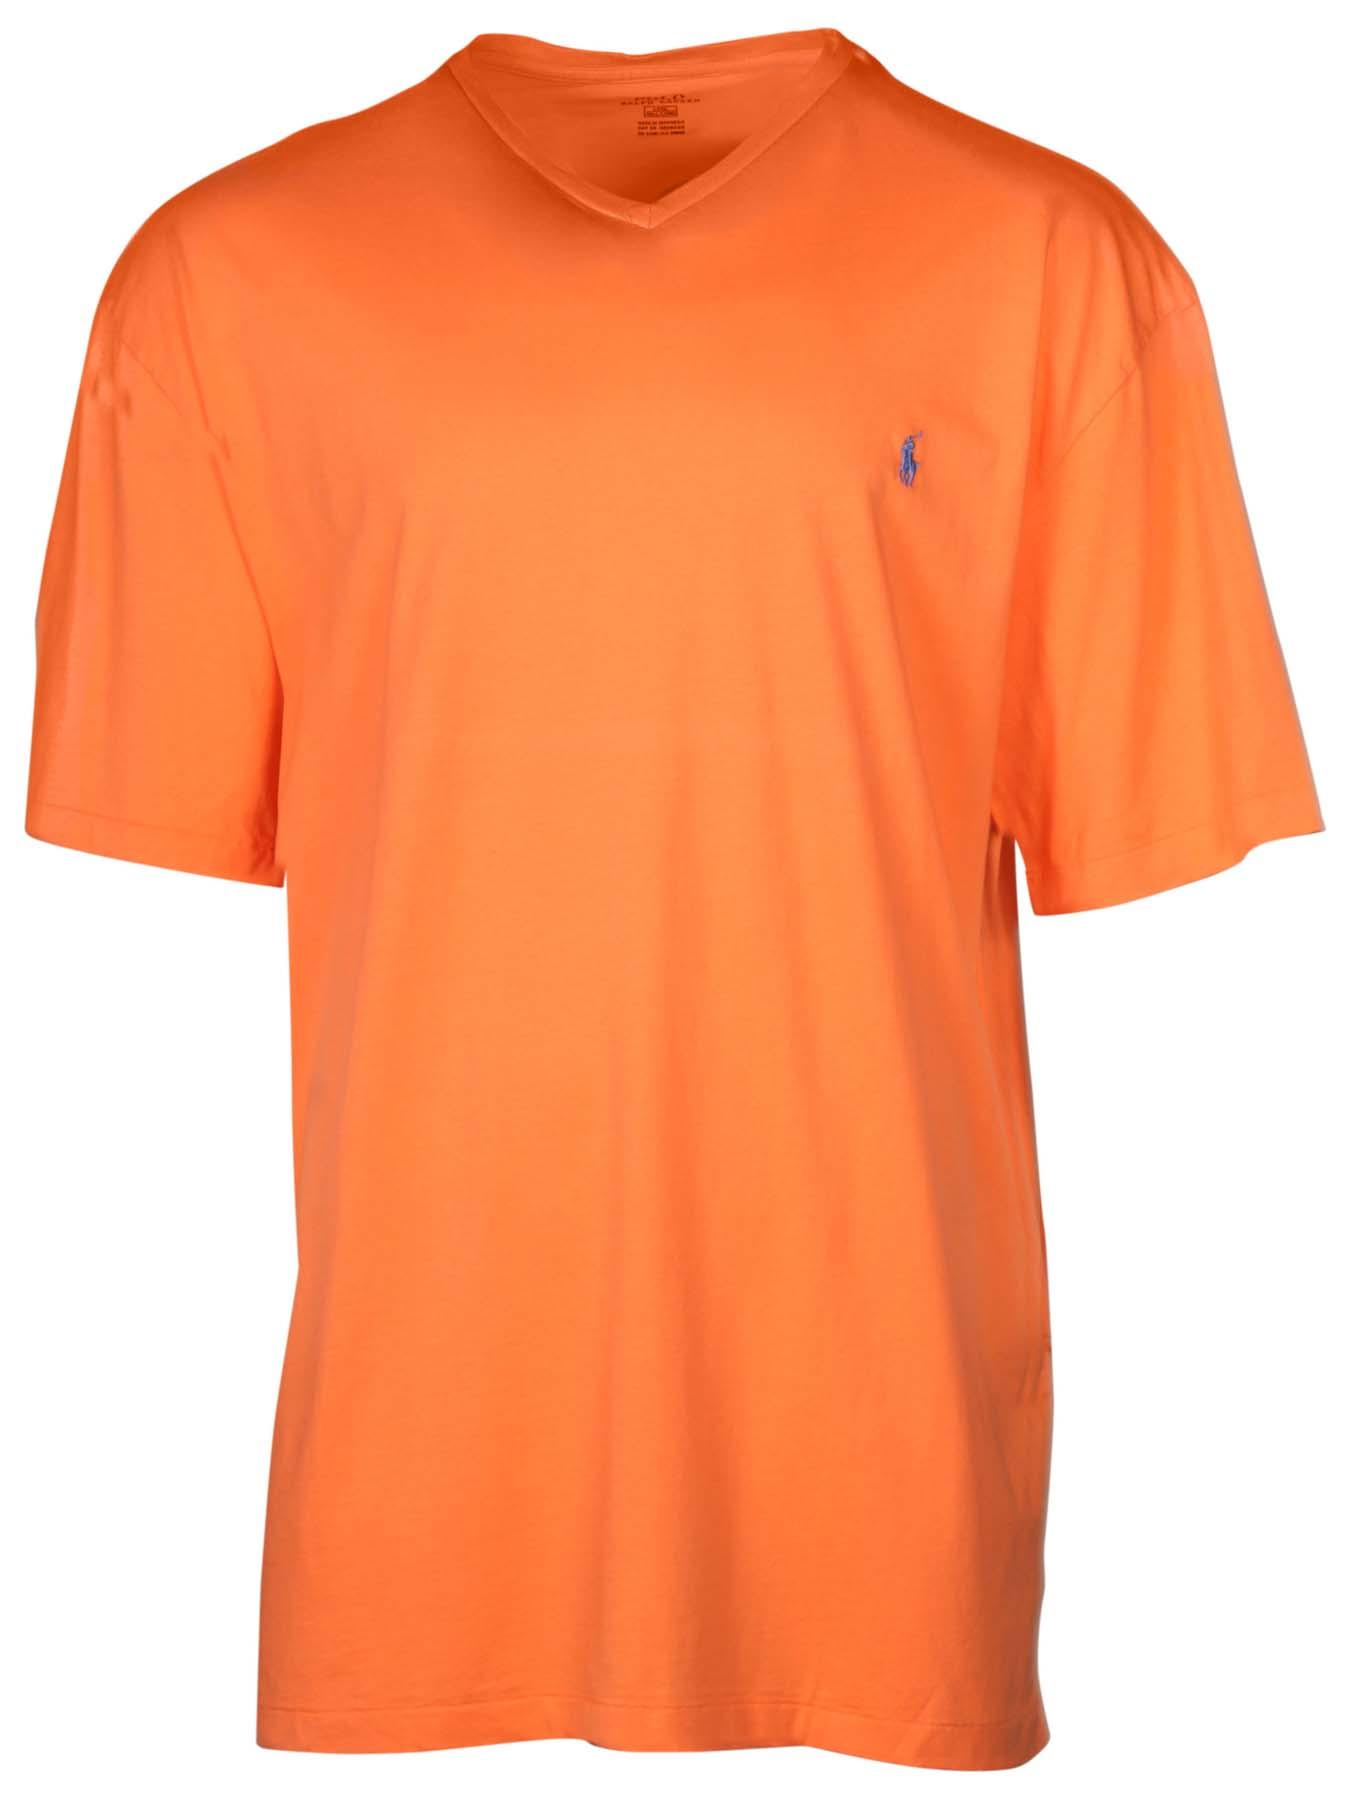 Polo ralph lauren men 39 s big tall v neck pony t shirt ebay for Mens tall v neck t shirts